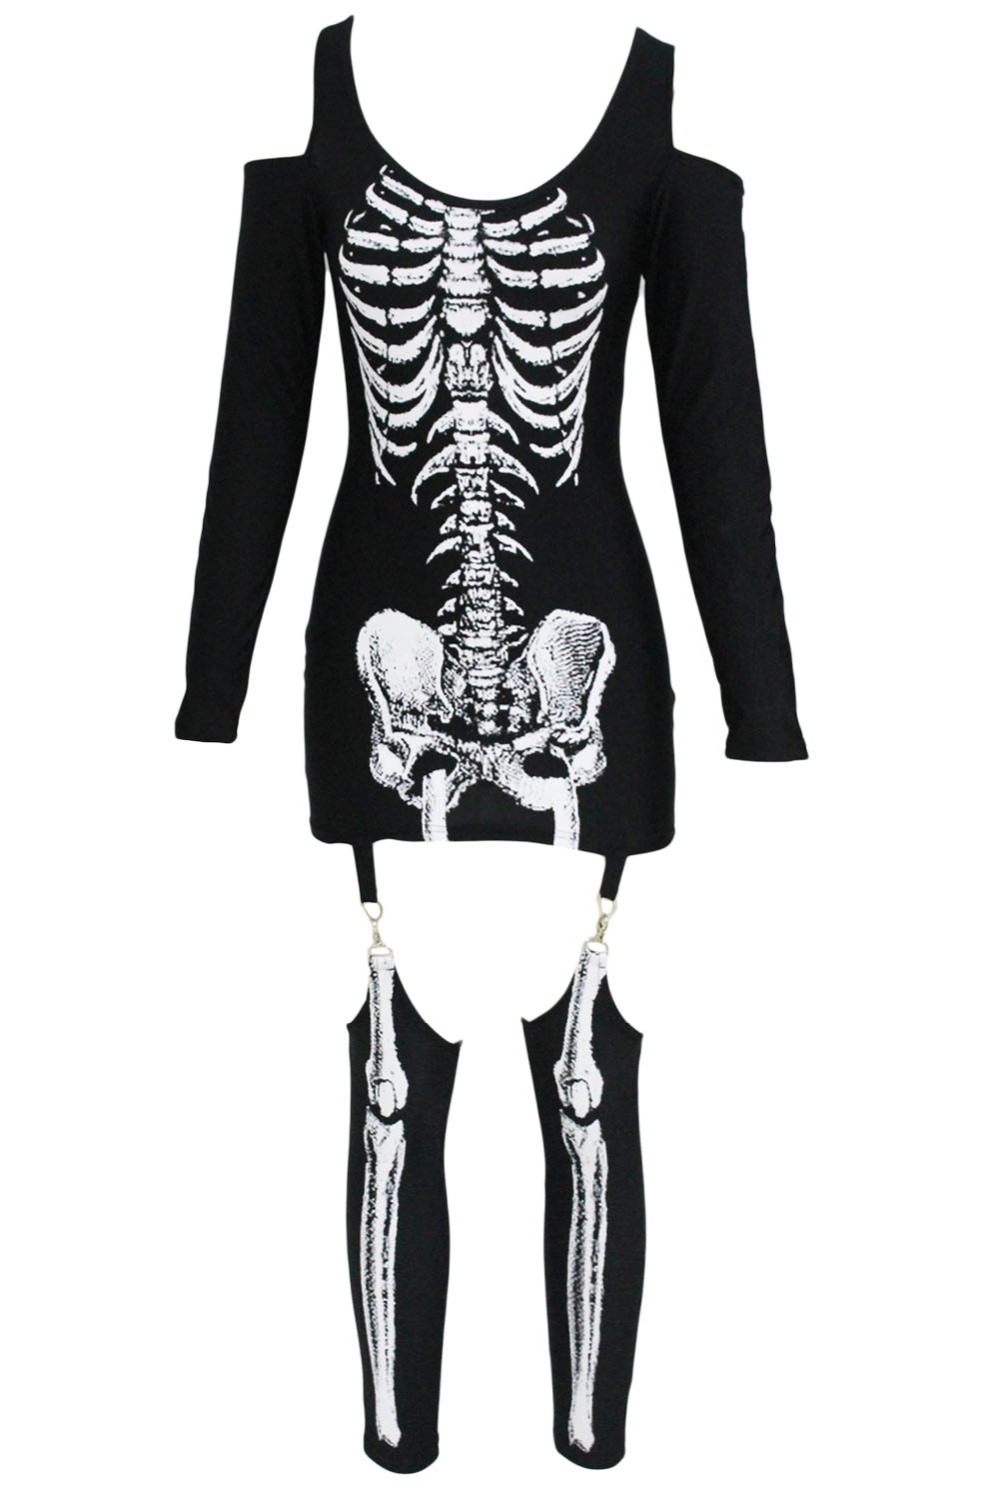 X-rayed-Halloween-Off-shoulder-Skeleton-Dress-Costume-LC89025-2-2